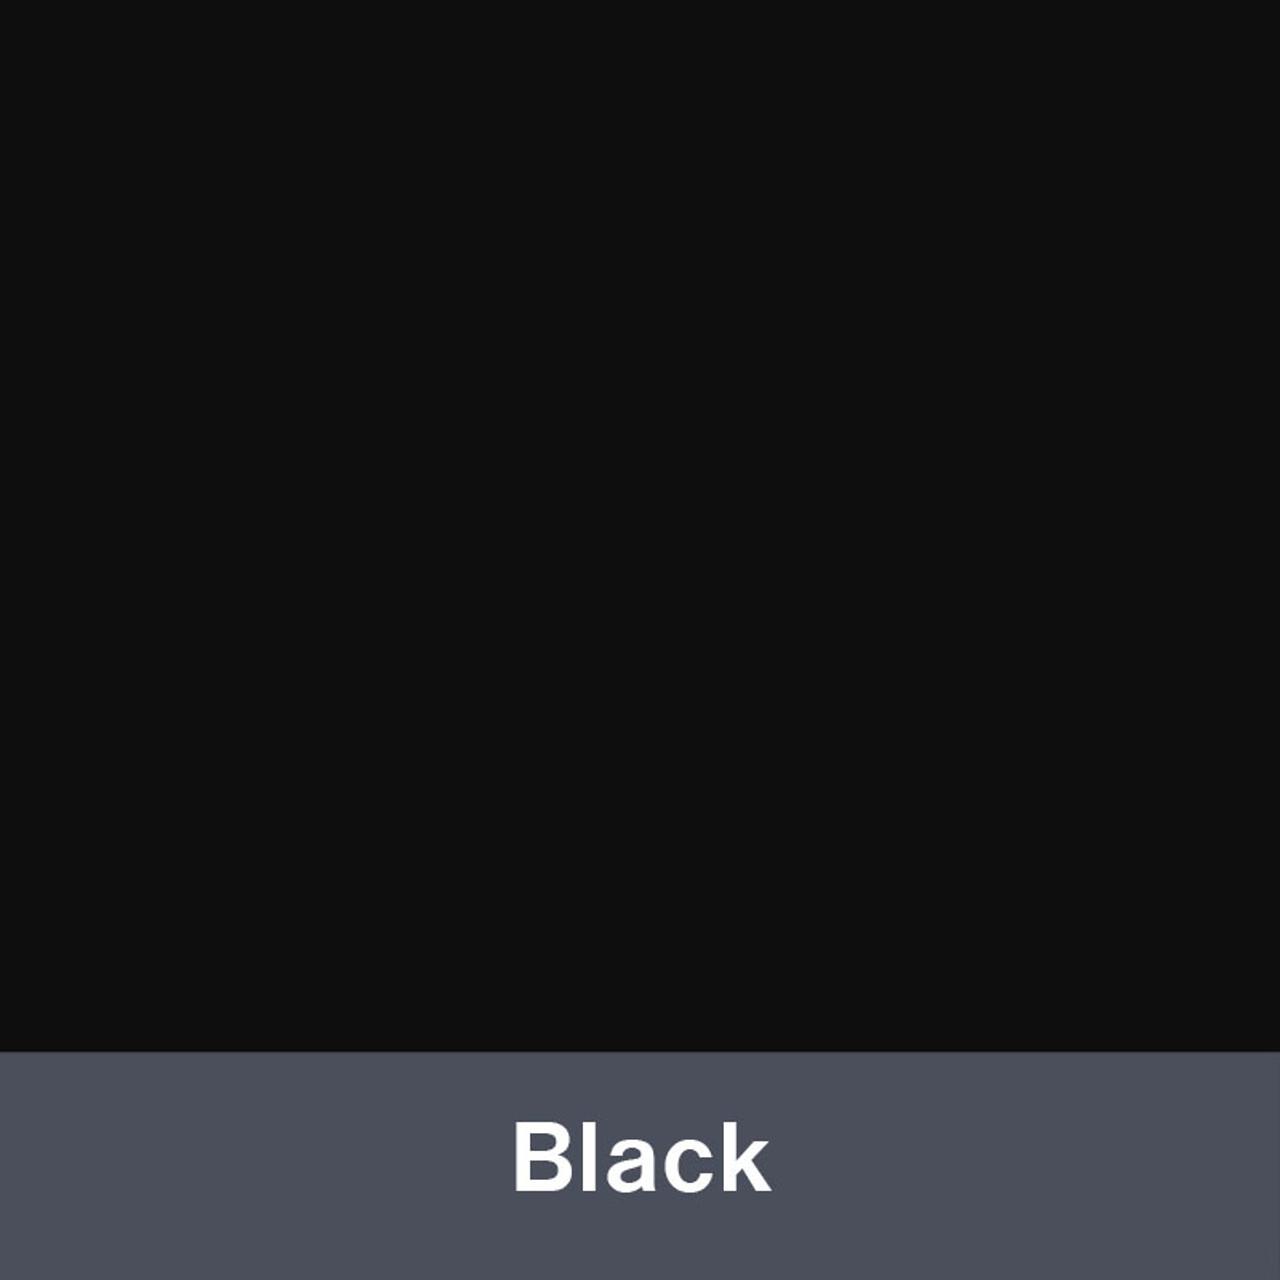 "Black (Gloss) 12"" x 24"" Permanent"